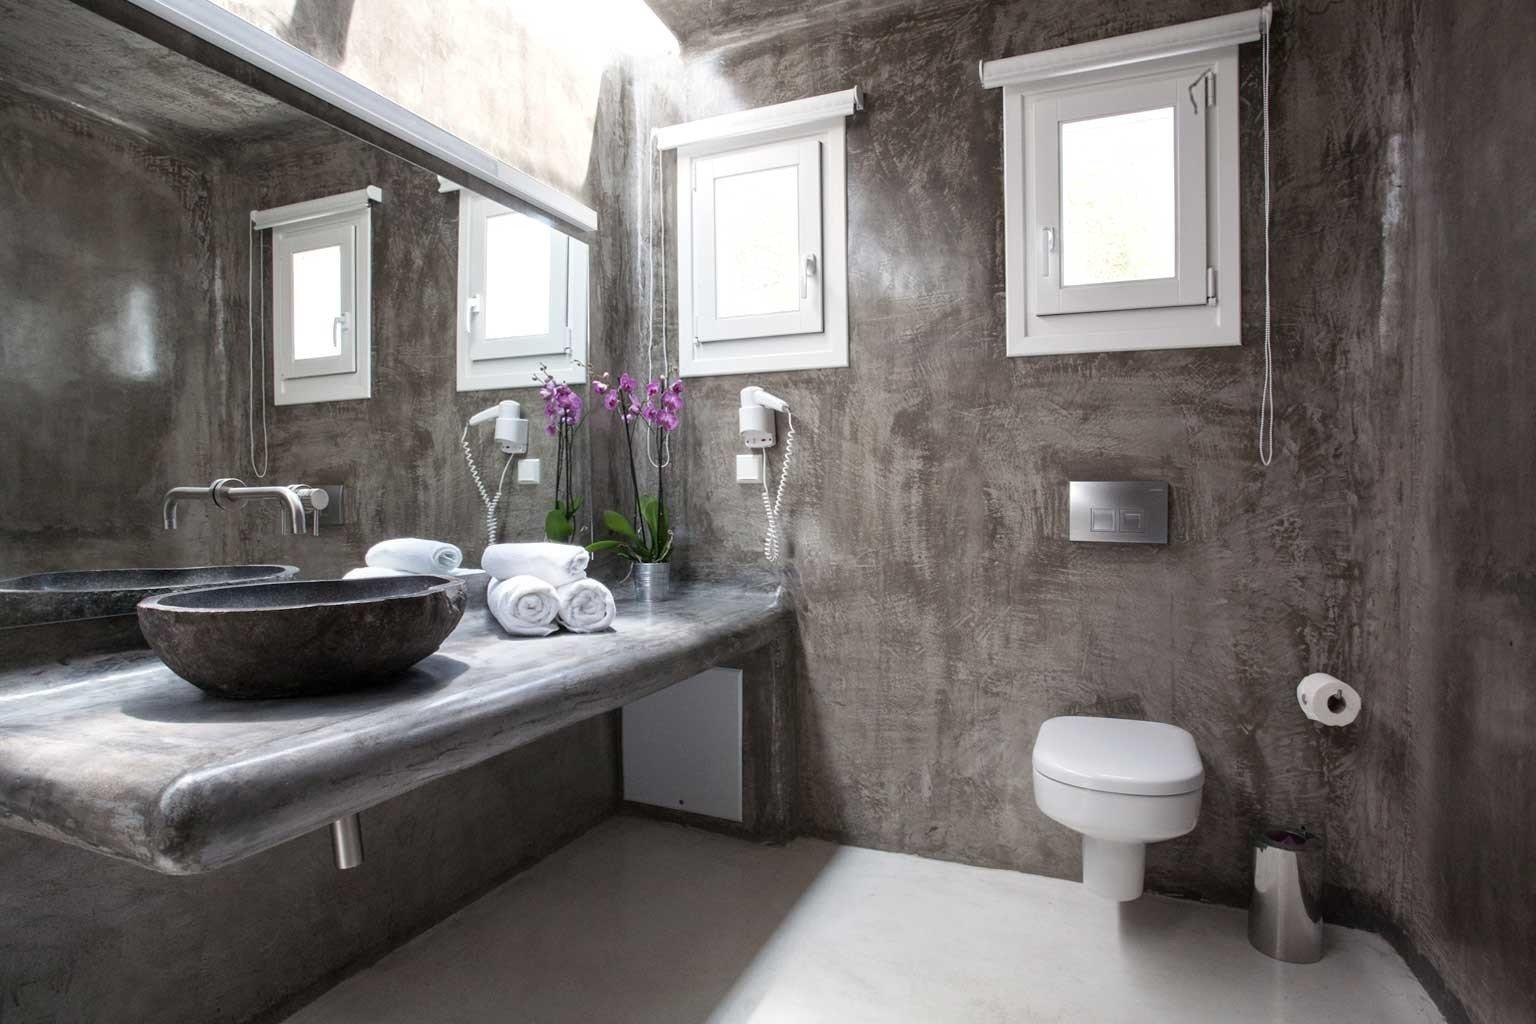 Bath Hip Luxury Modern bathroom property house toilet home cottage sink mansion tub stone